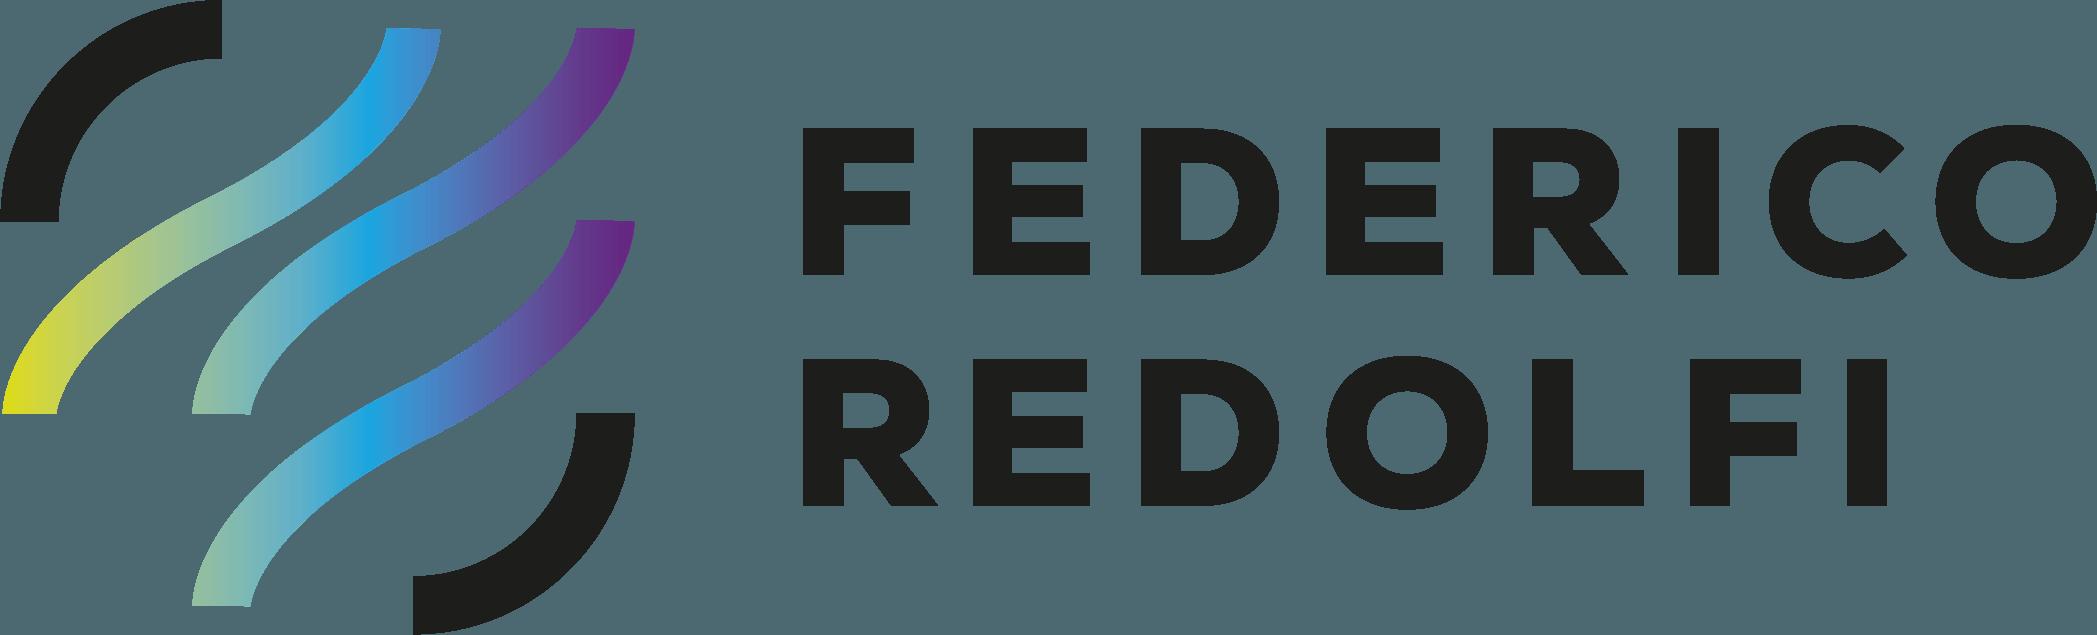 Federico Redolfi